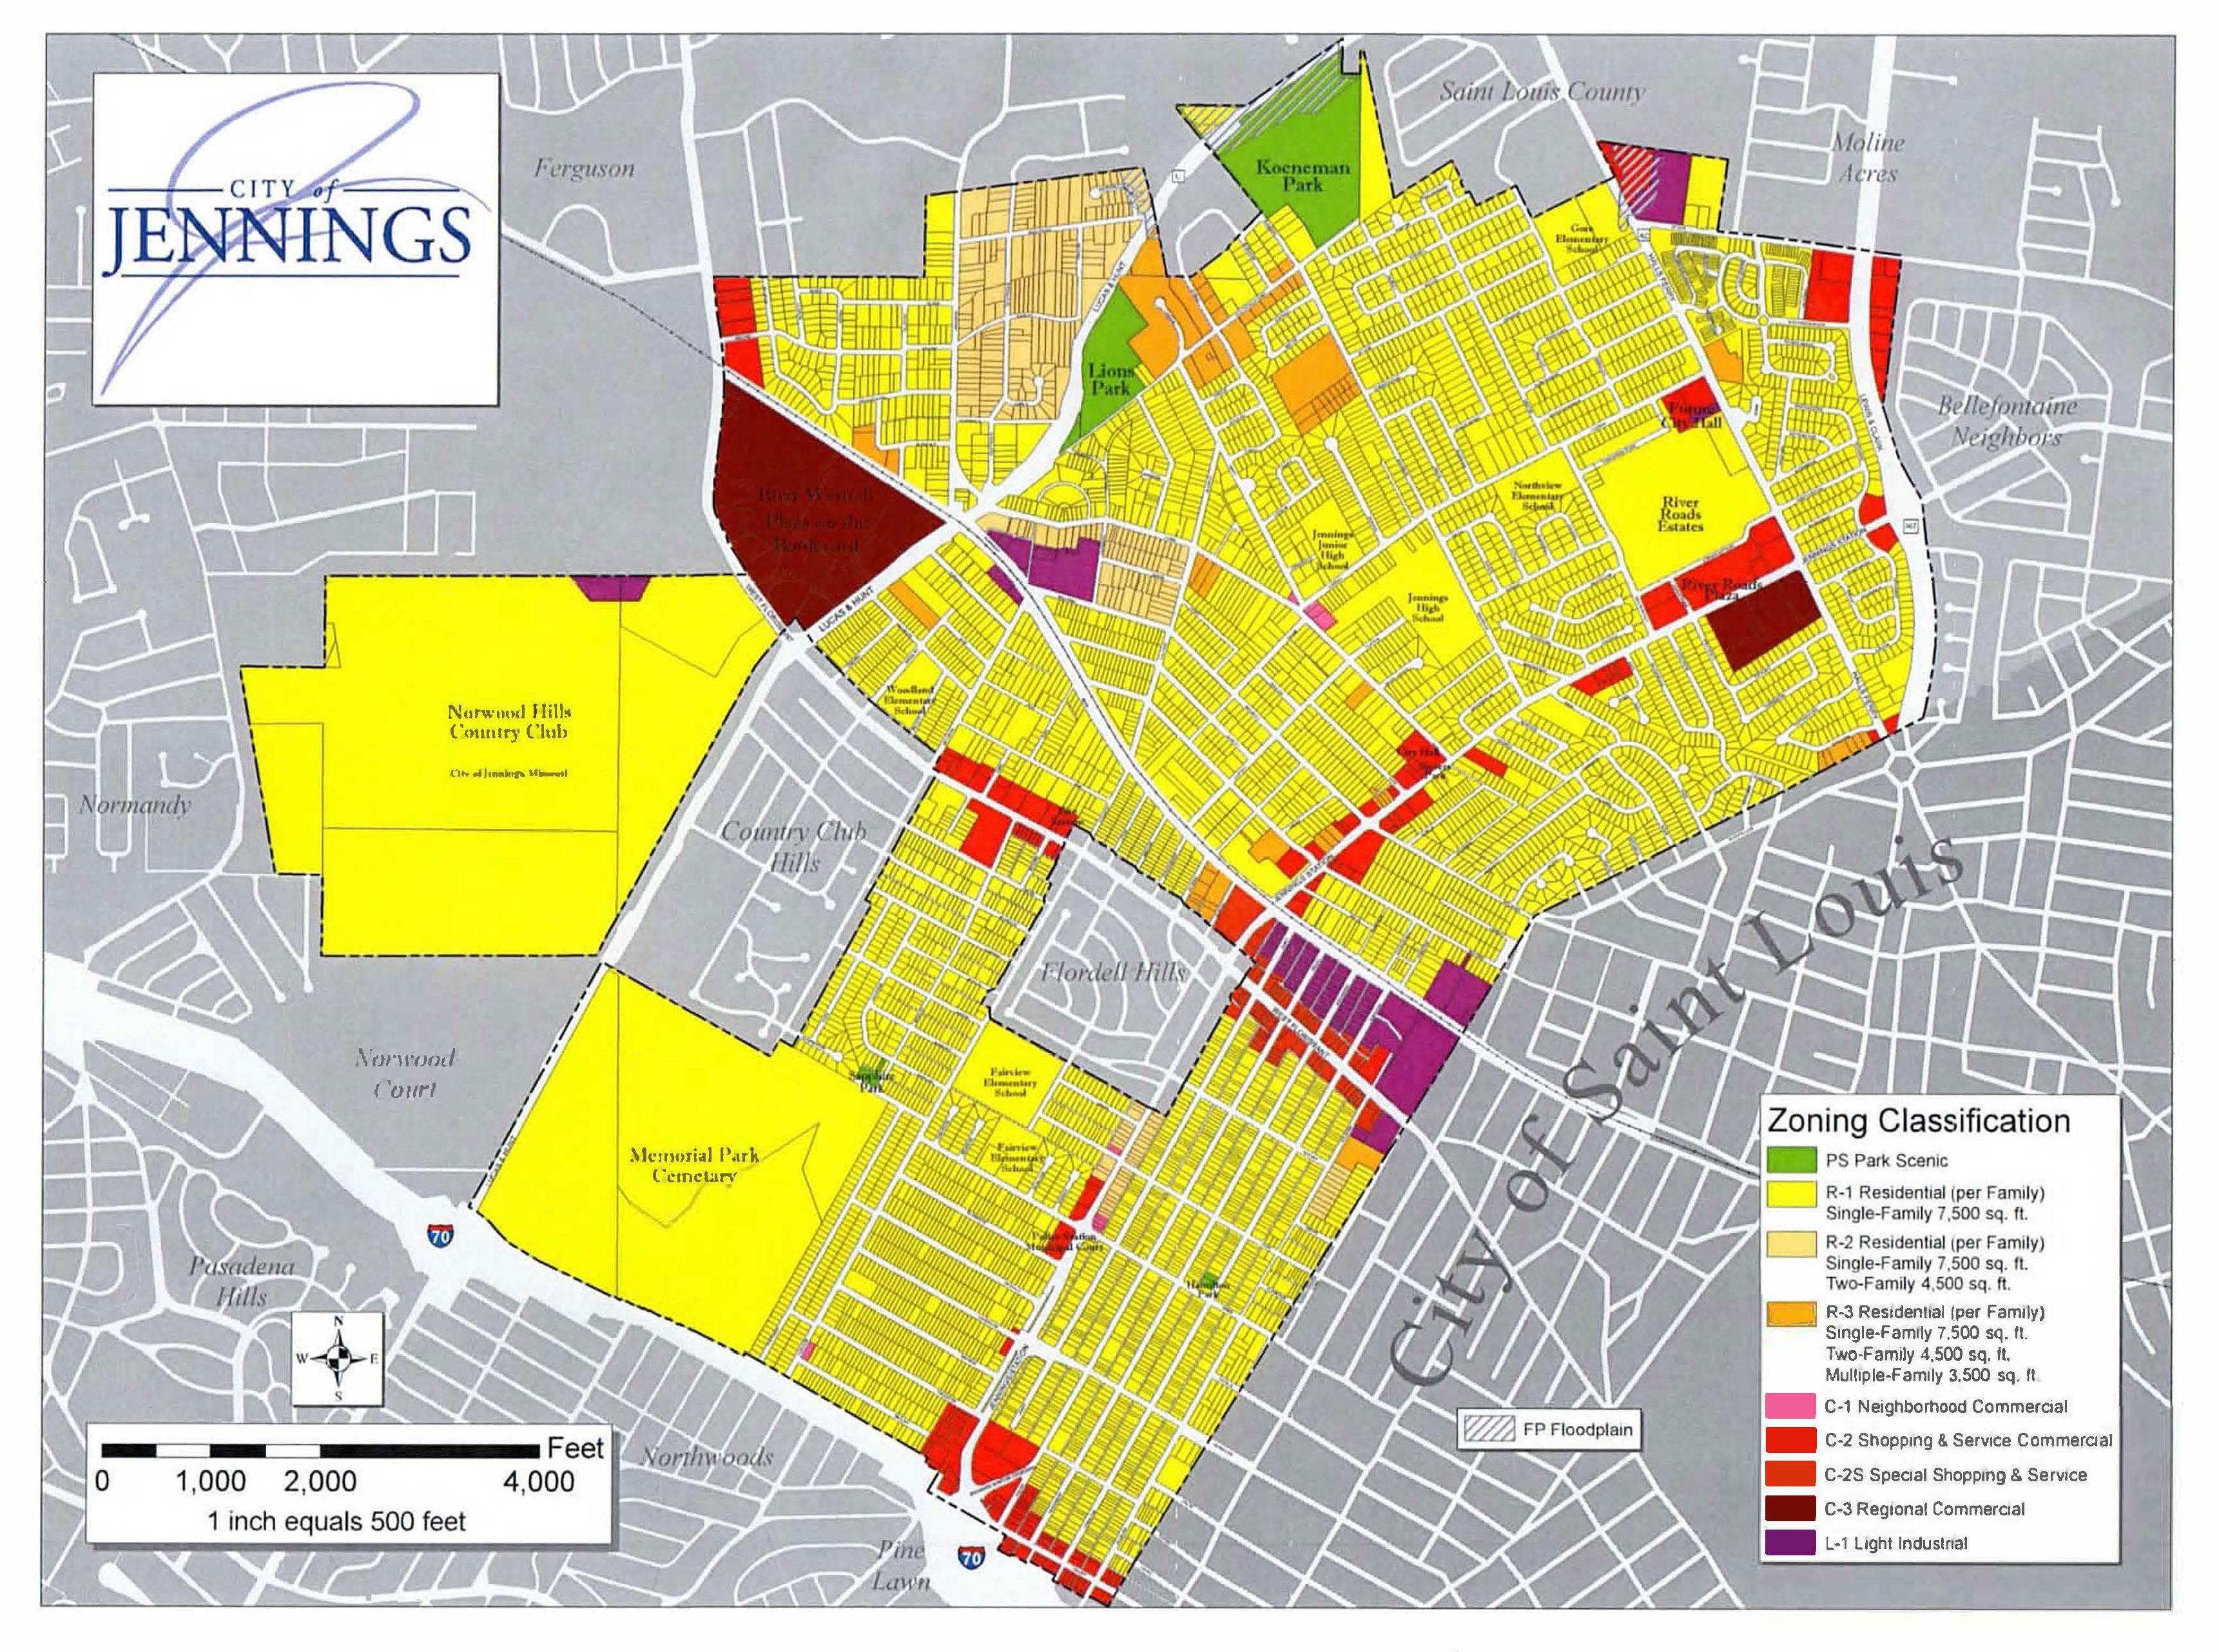 City of Jennings - Zoning Map Zoning Map on